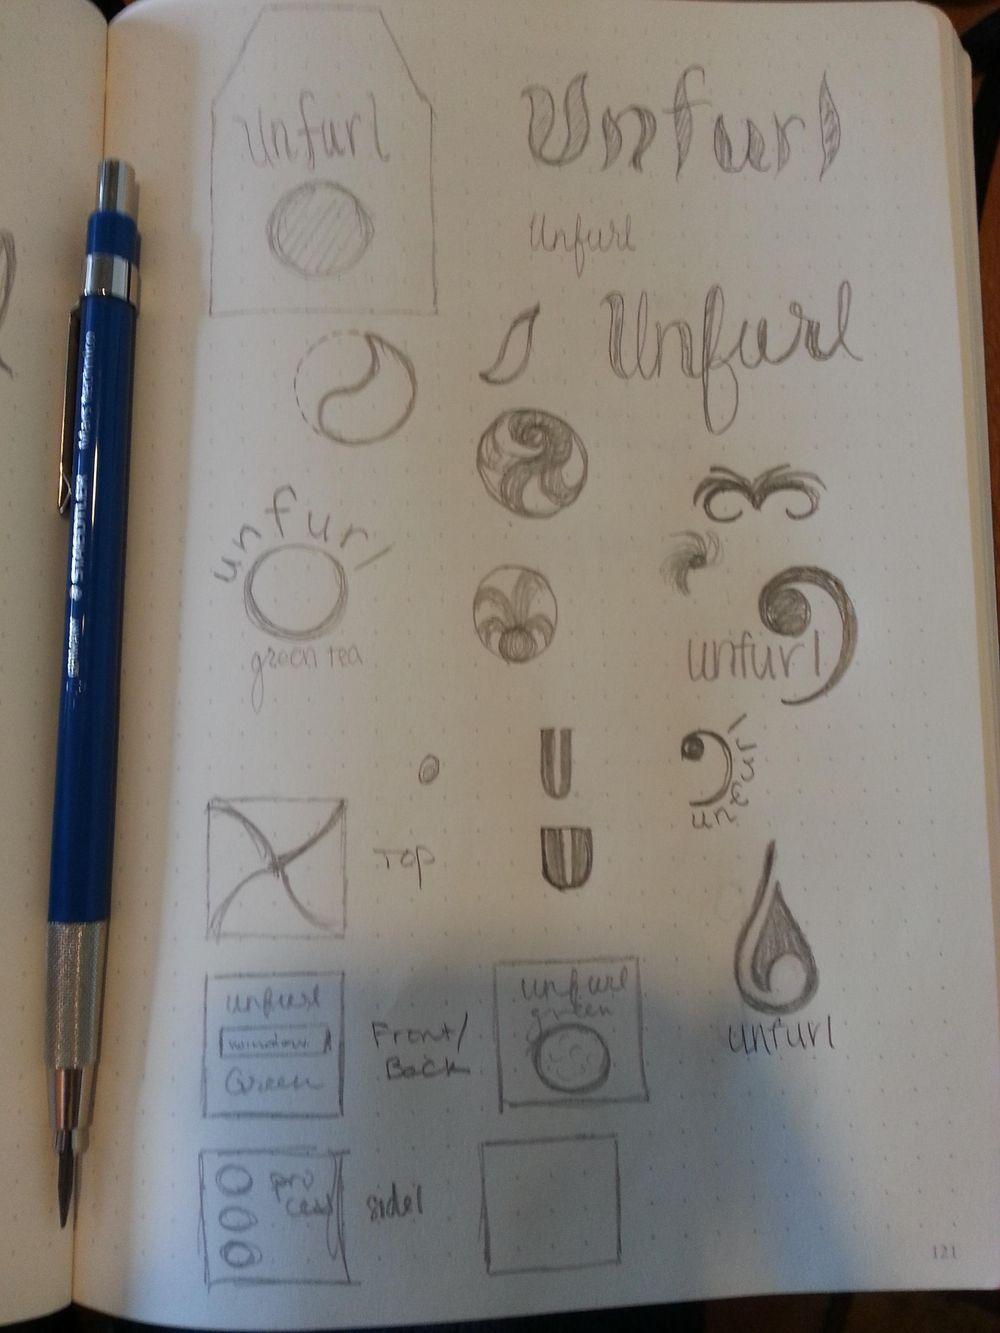 Unfurl: Loose Leaf Tea - image 4 - student project